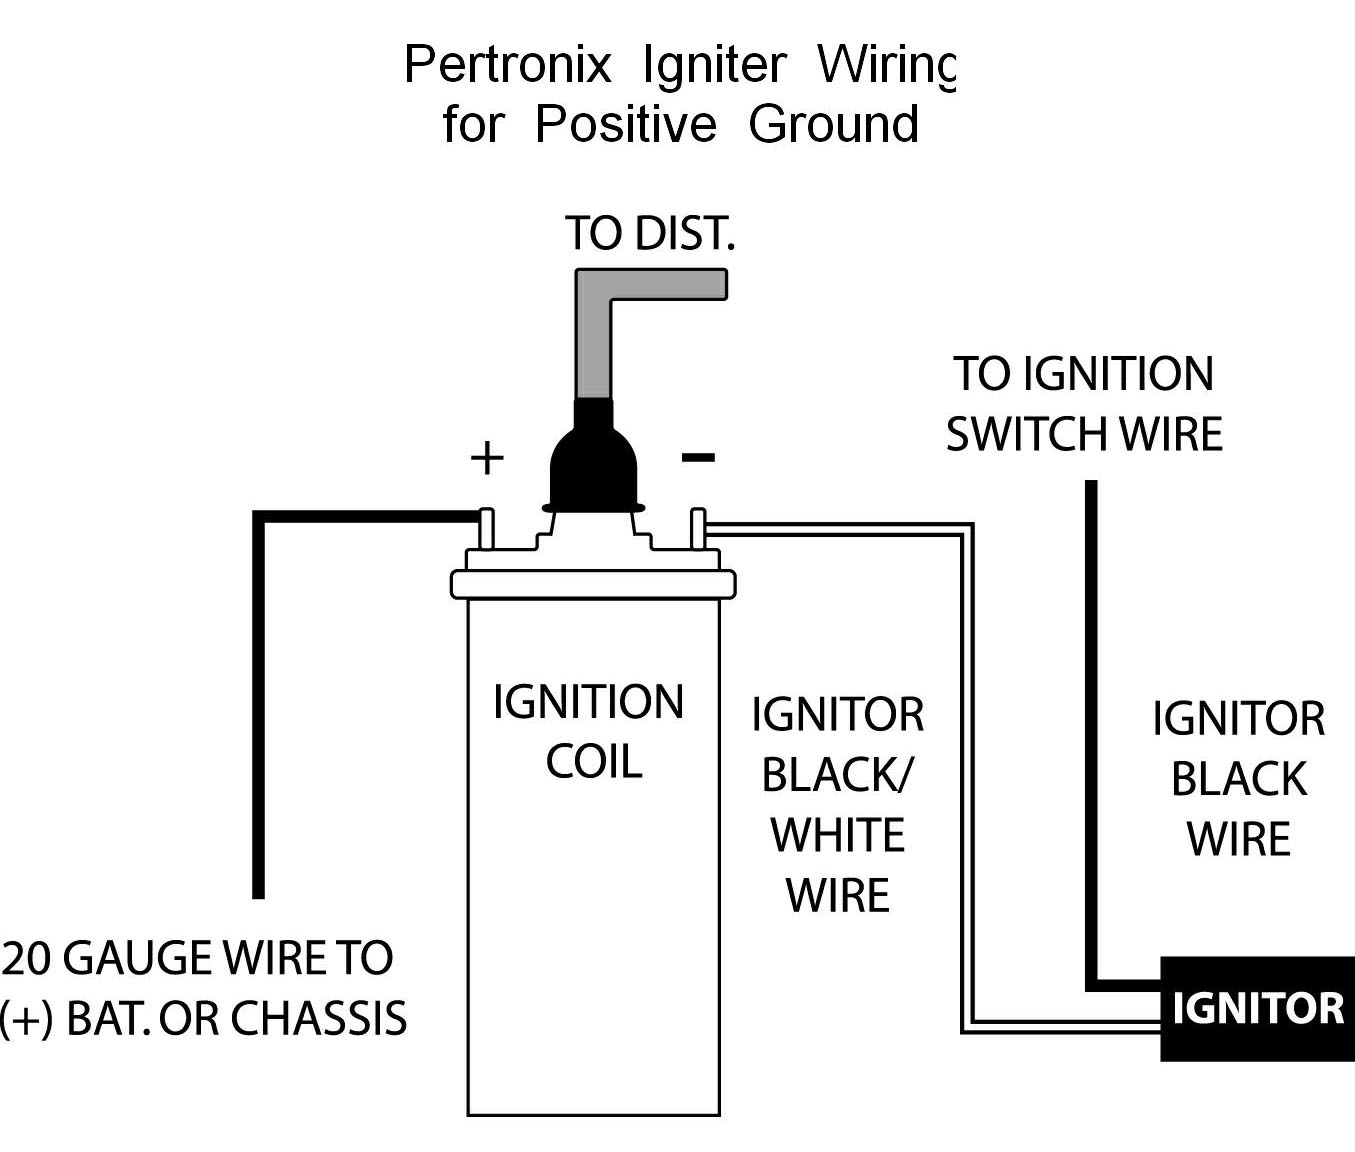 Ignition Coil Circuit Diagram | Wiring Diagram - Ignition Coil Wiring Diagram